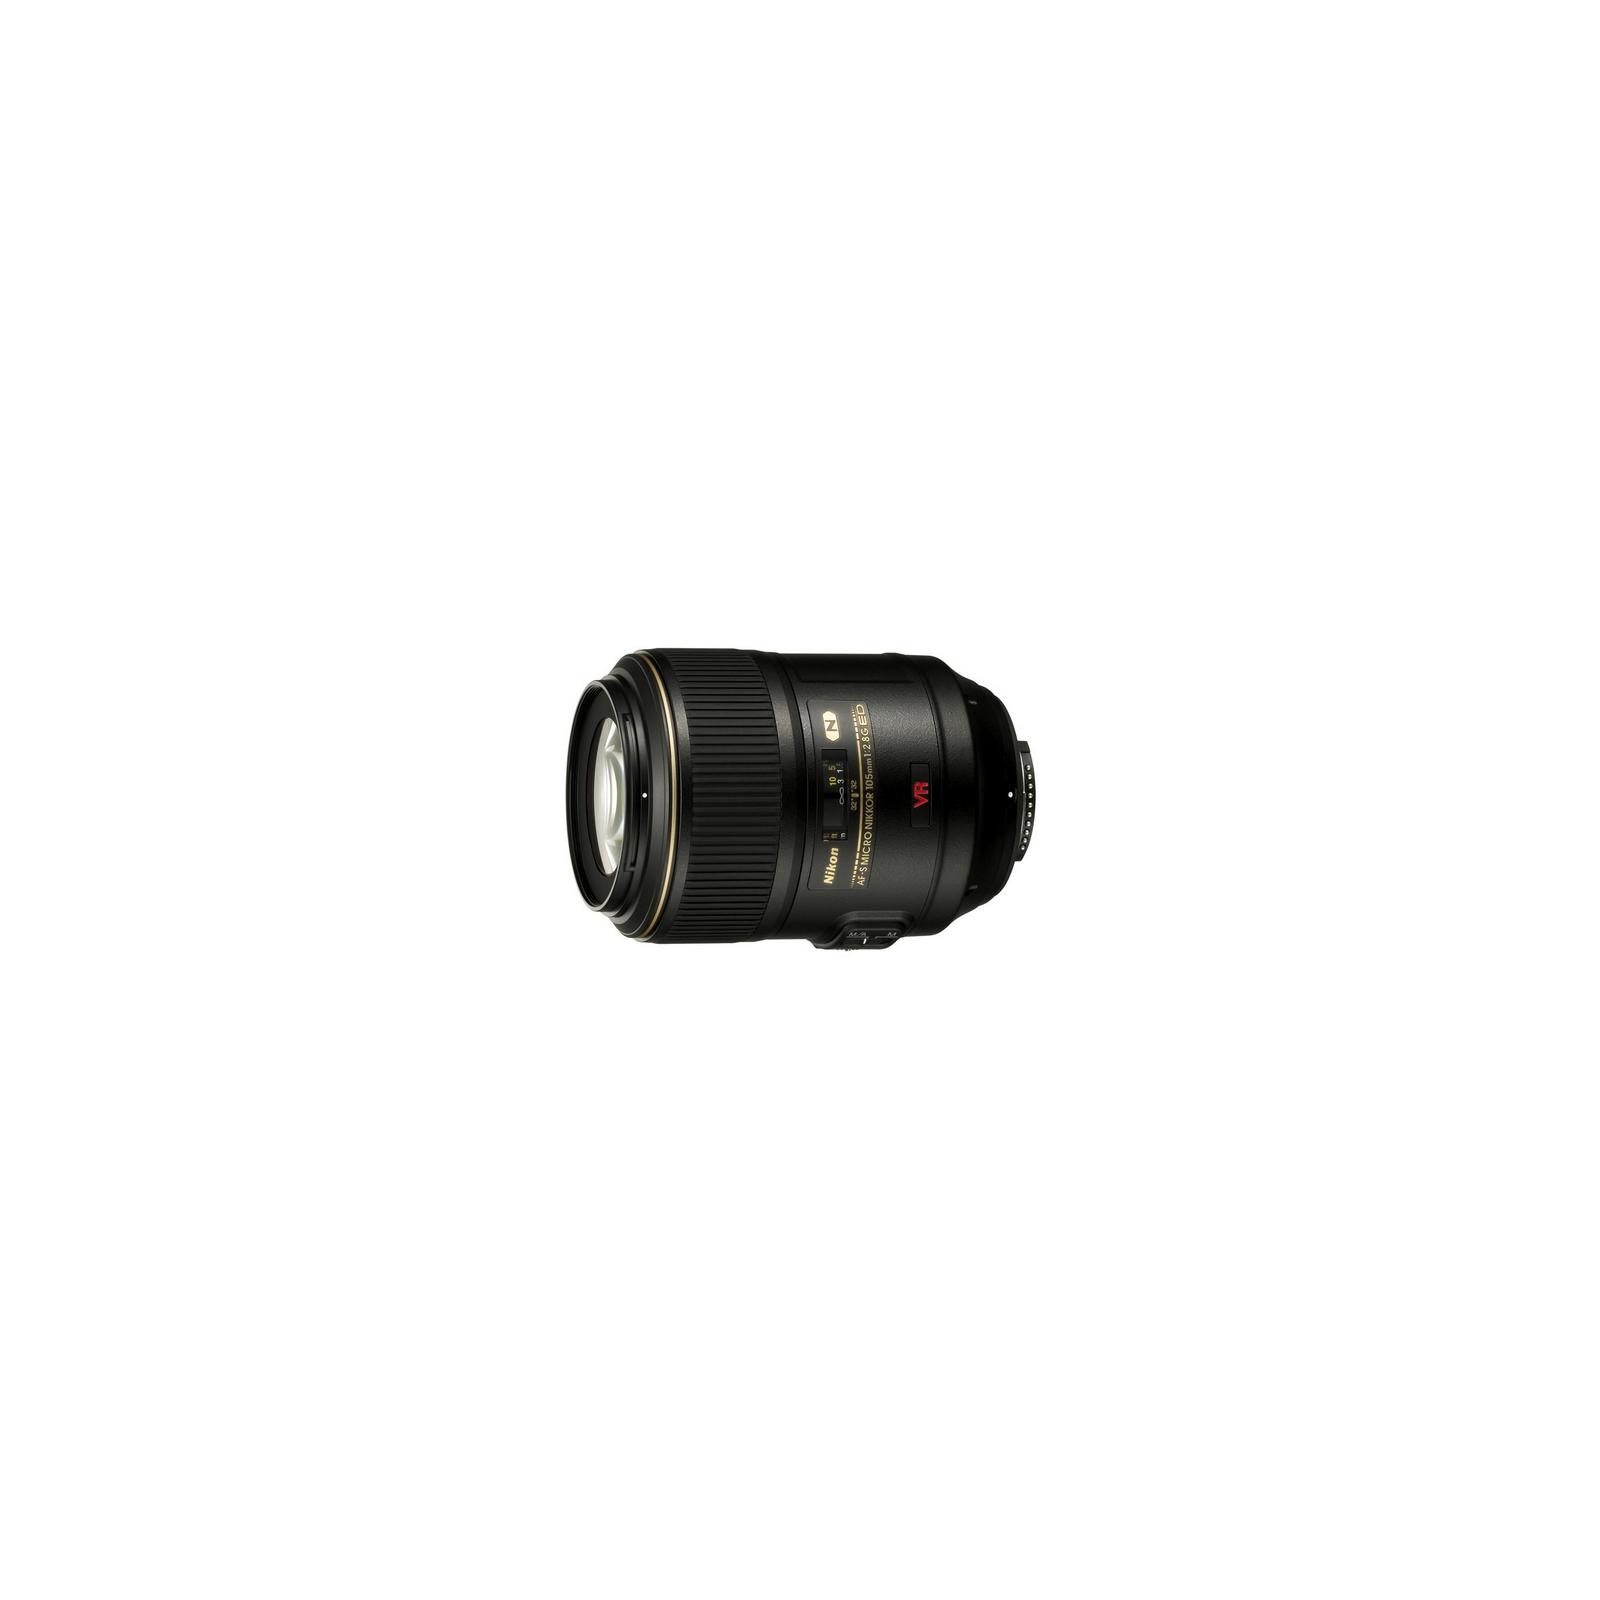 Объектив Nikkor AF-S 105mm f/2.8G IF-ED VRII Nikon (JAA630DA) изображение 2